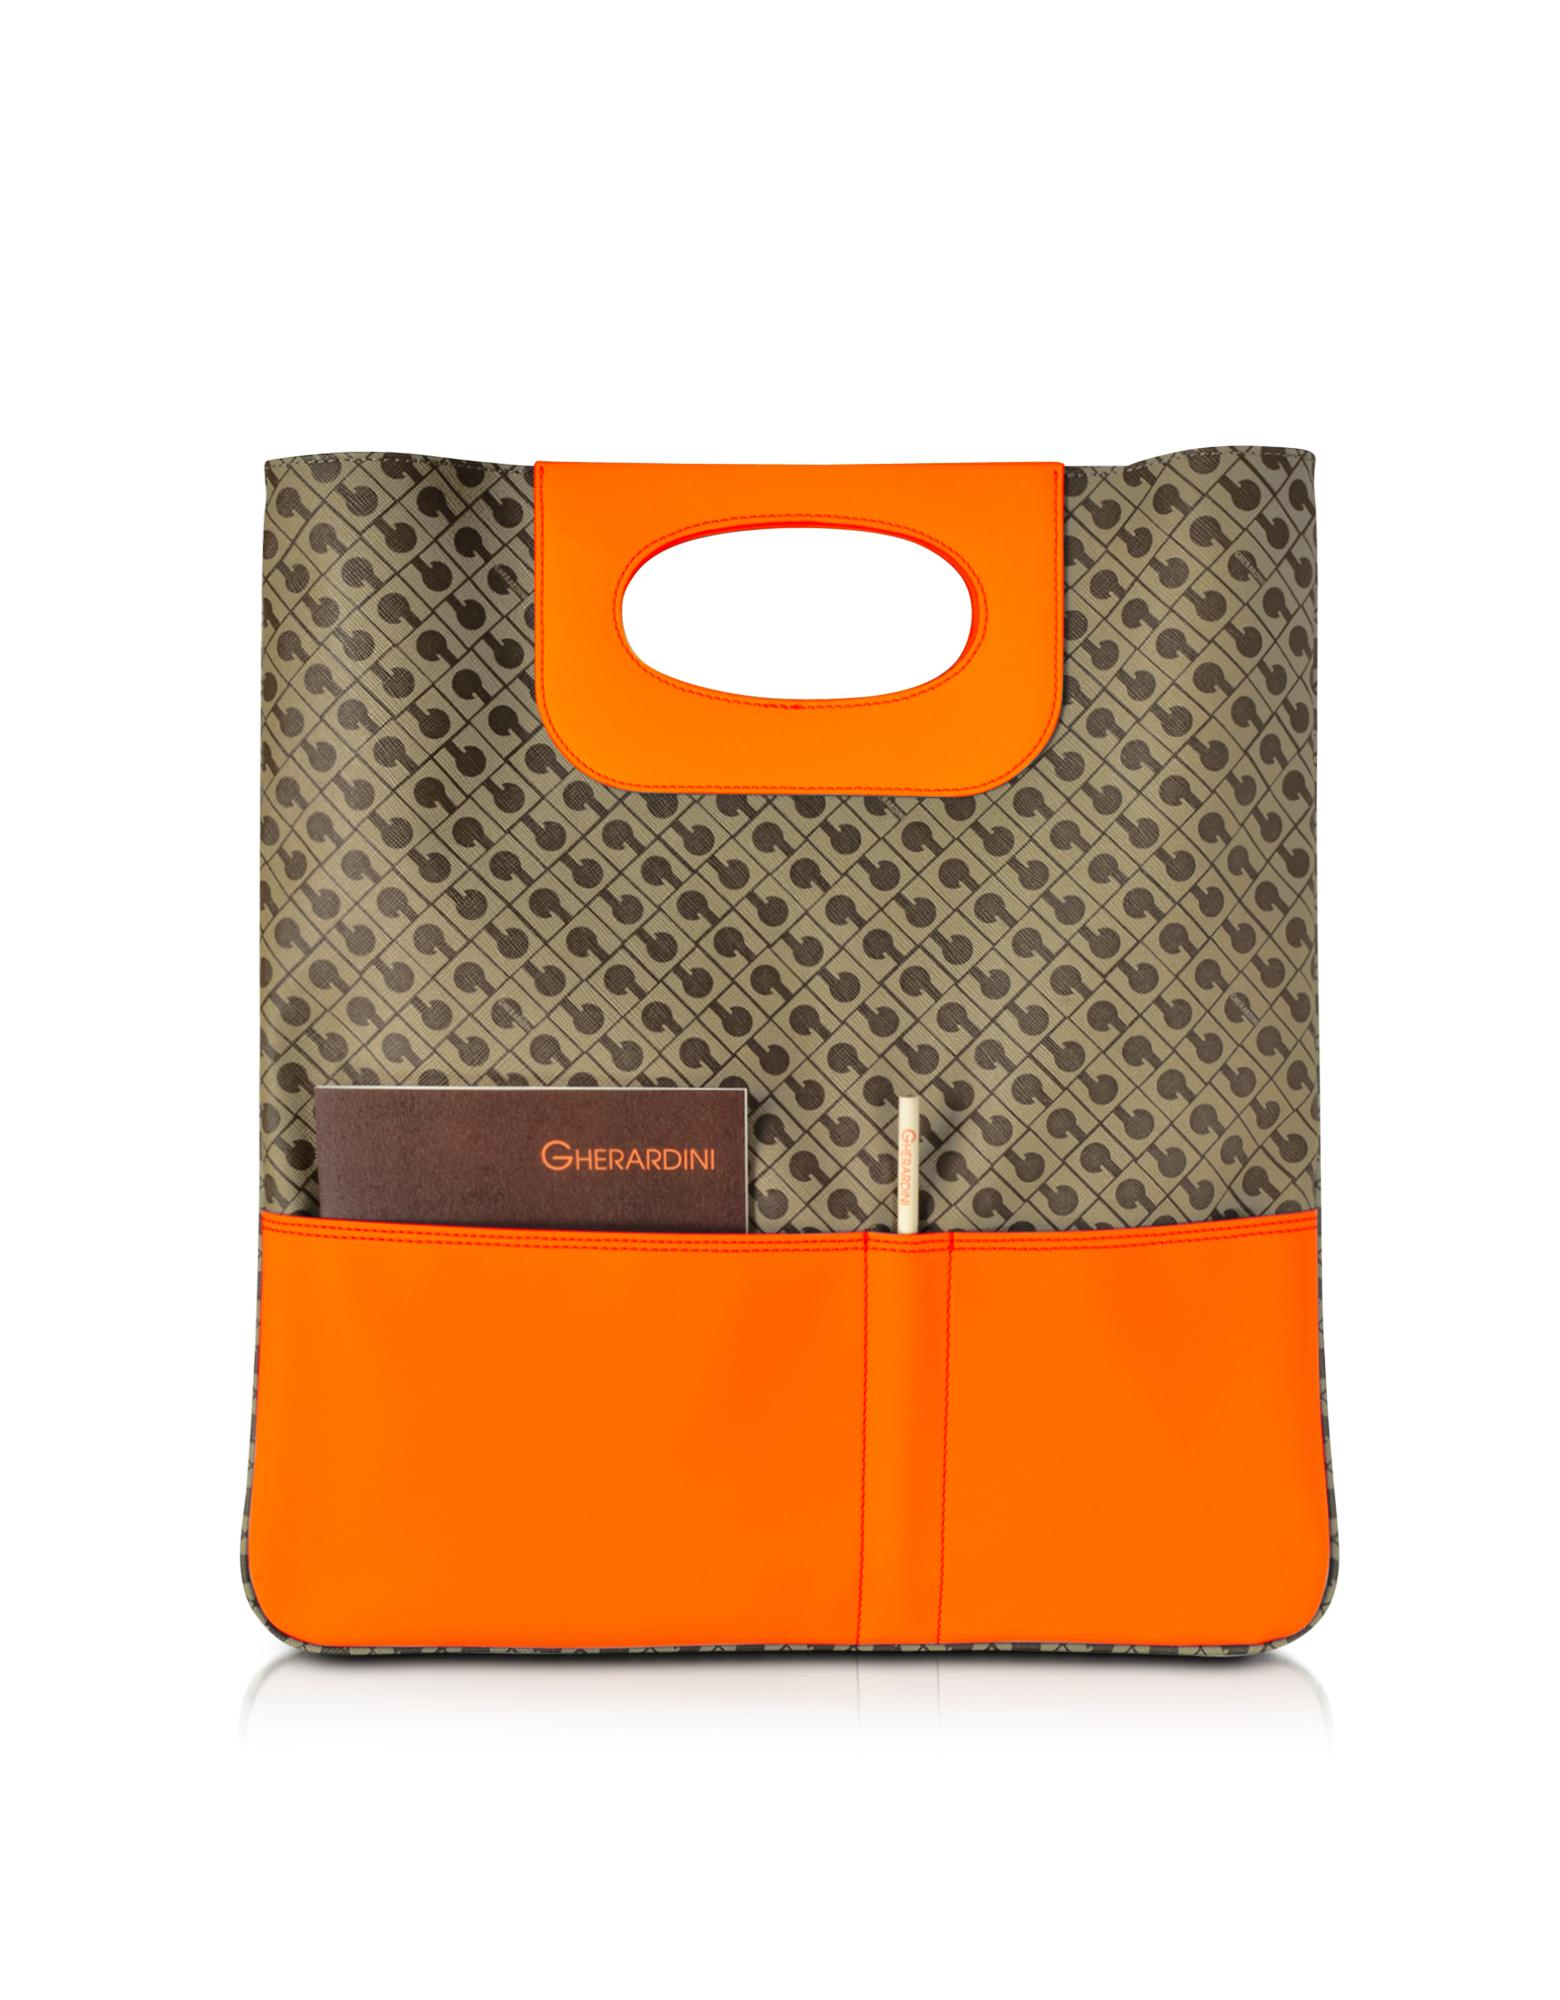 Julieta Millerighe Fabric and Eco Leather Flat Tote Bag - Gherardini